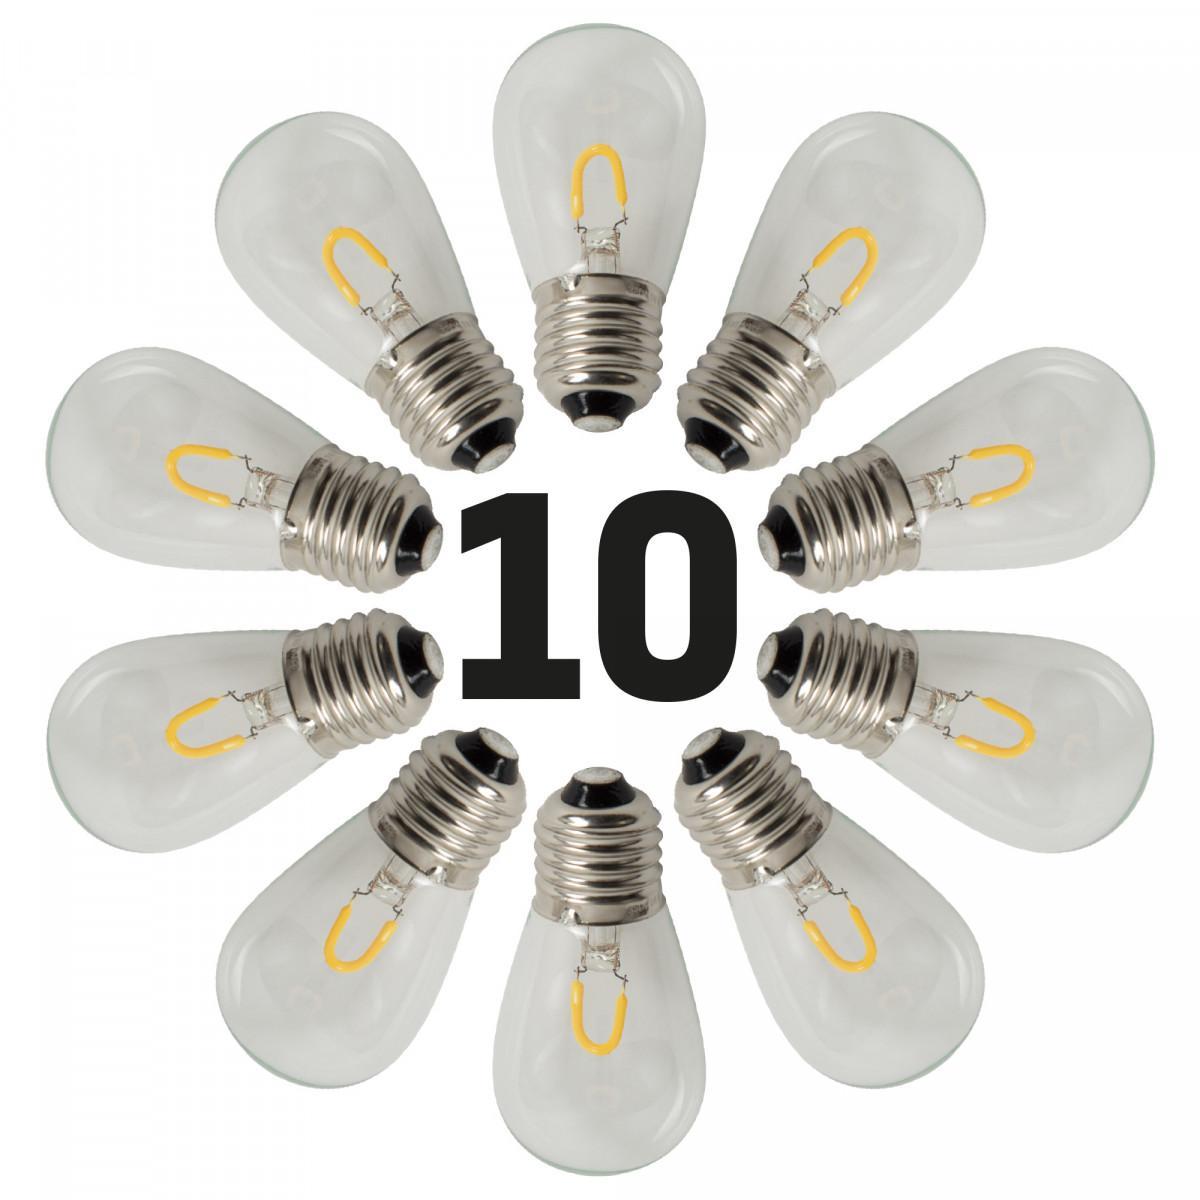 LED Feestverlichting 10 x 1 Watt - 10 helder